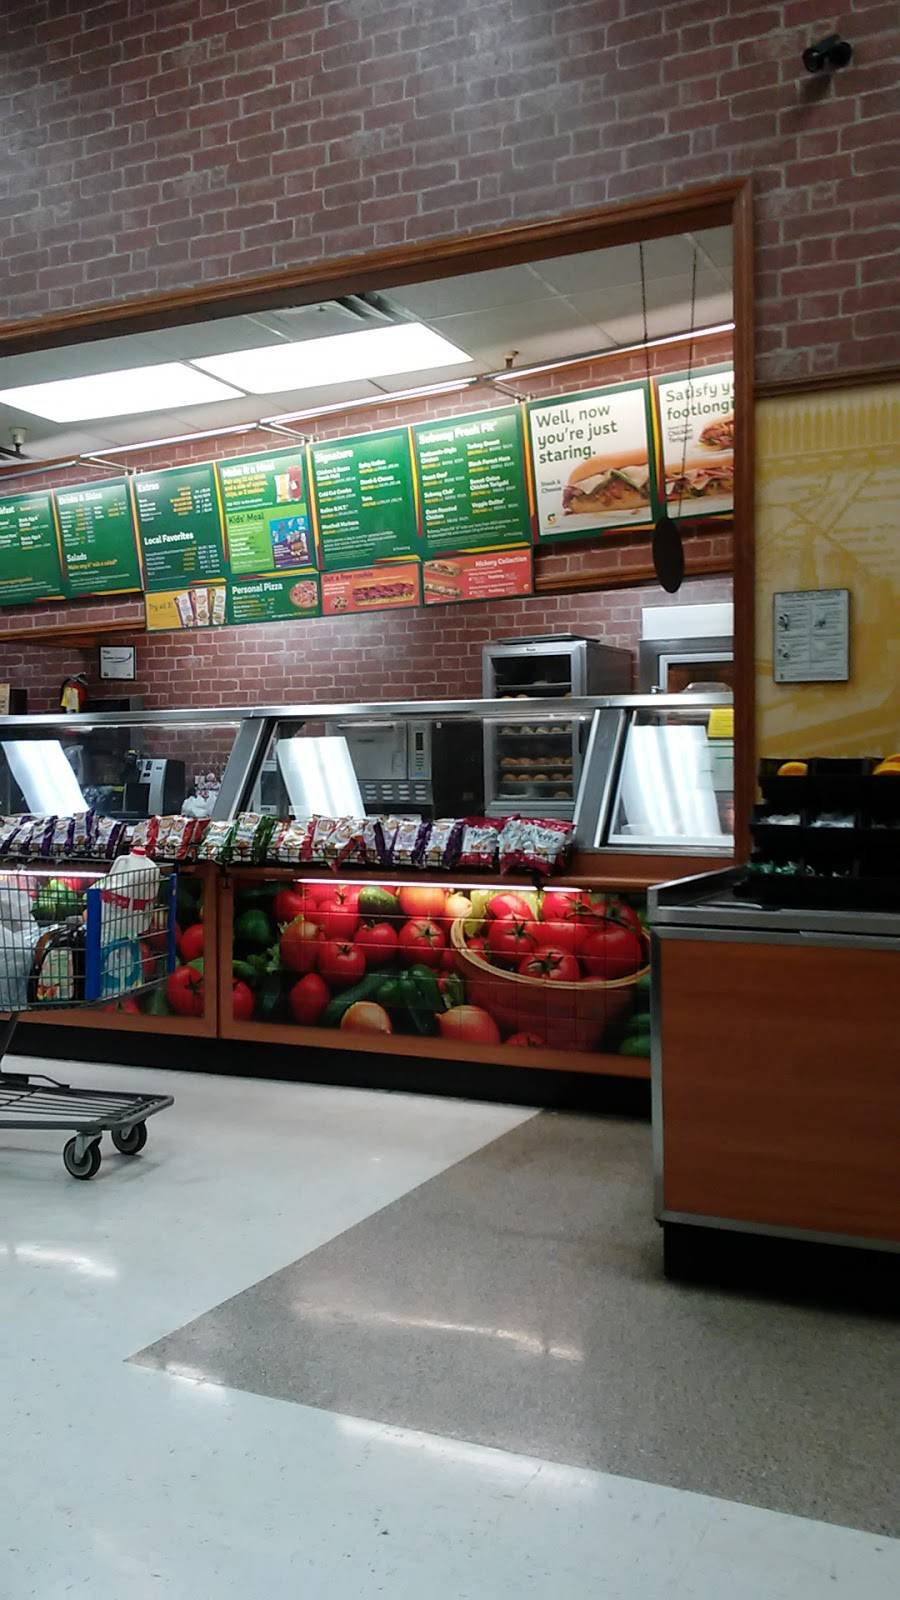 Subway | restaurant | 6586 GA-40, St Marys, GA 31558, USA | 9128827661 OR +1 912-882-7661